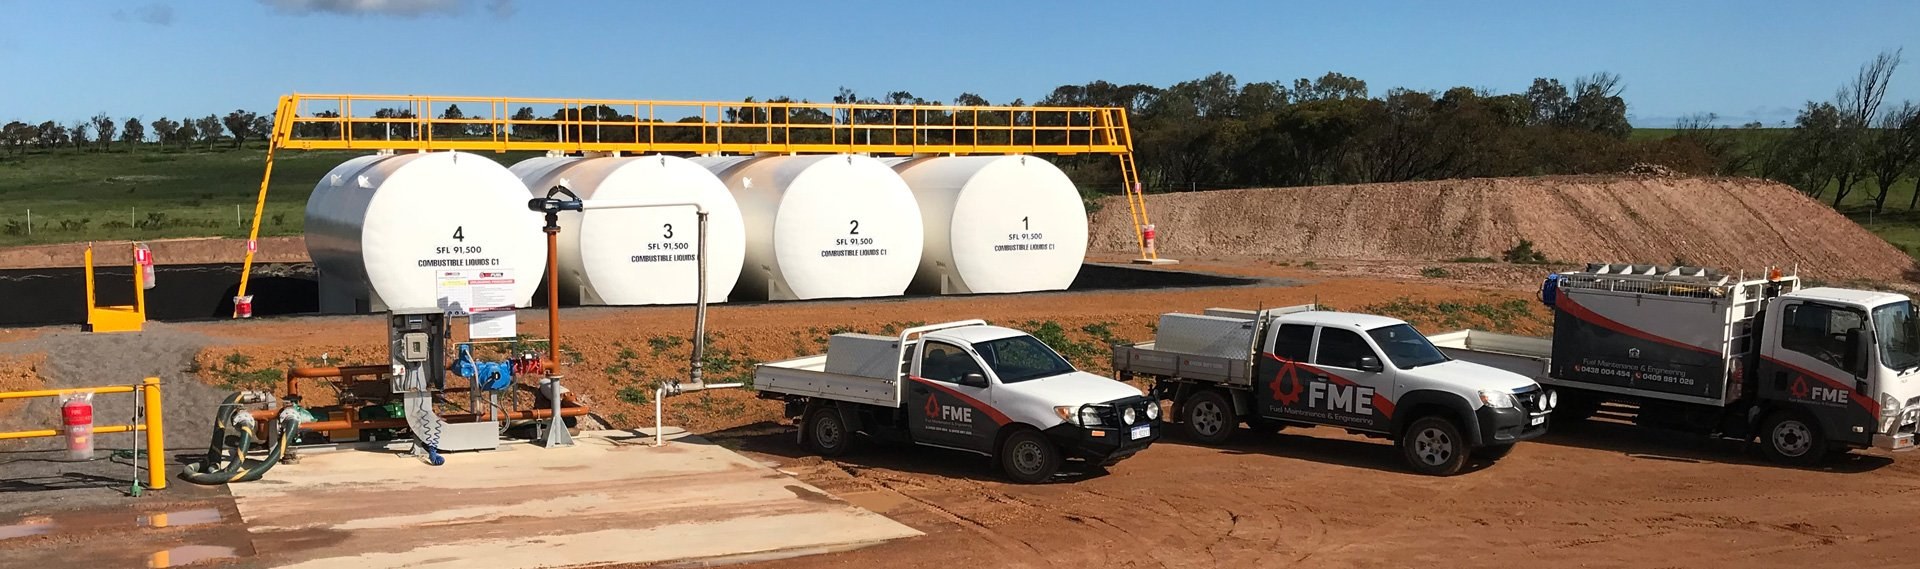 Fuel Maintenance Vehicles